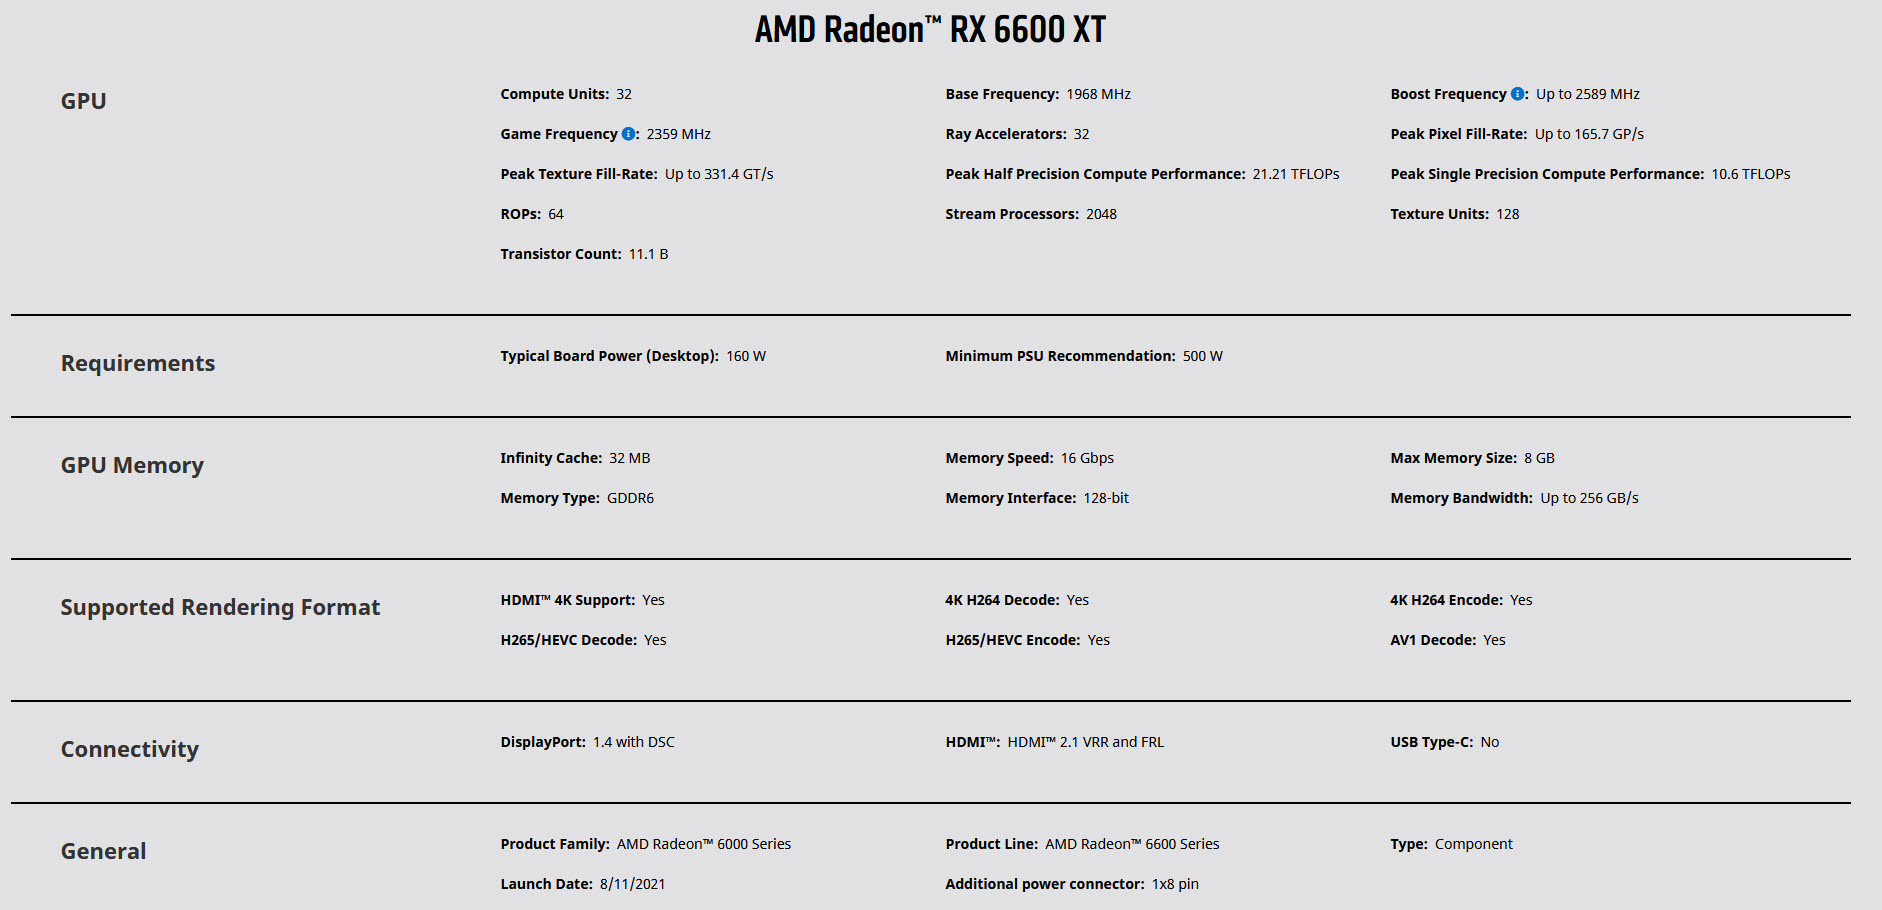 2021 07 31 12 19 06 AMD เปิดตัวกราฟิกการ์ดใหม่ AMD Radeon RX 6600 XT มาตรฐานใหม่สำหรับการเล่นเกมเฟรมเรทและความคมชัดสูงในระดับความละเอียด 1080p